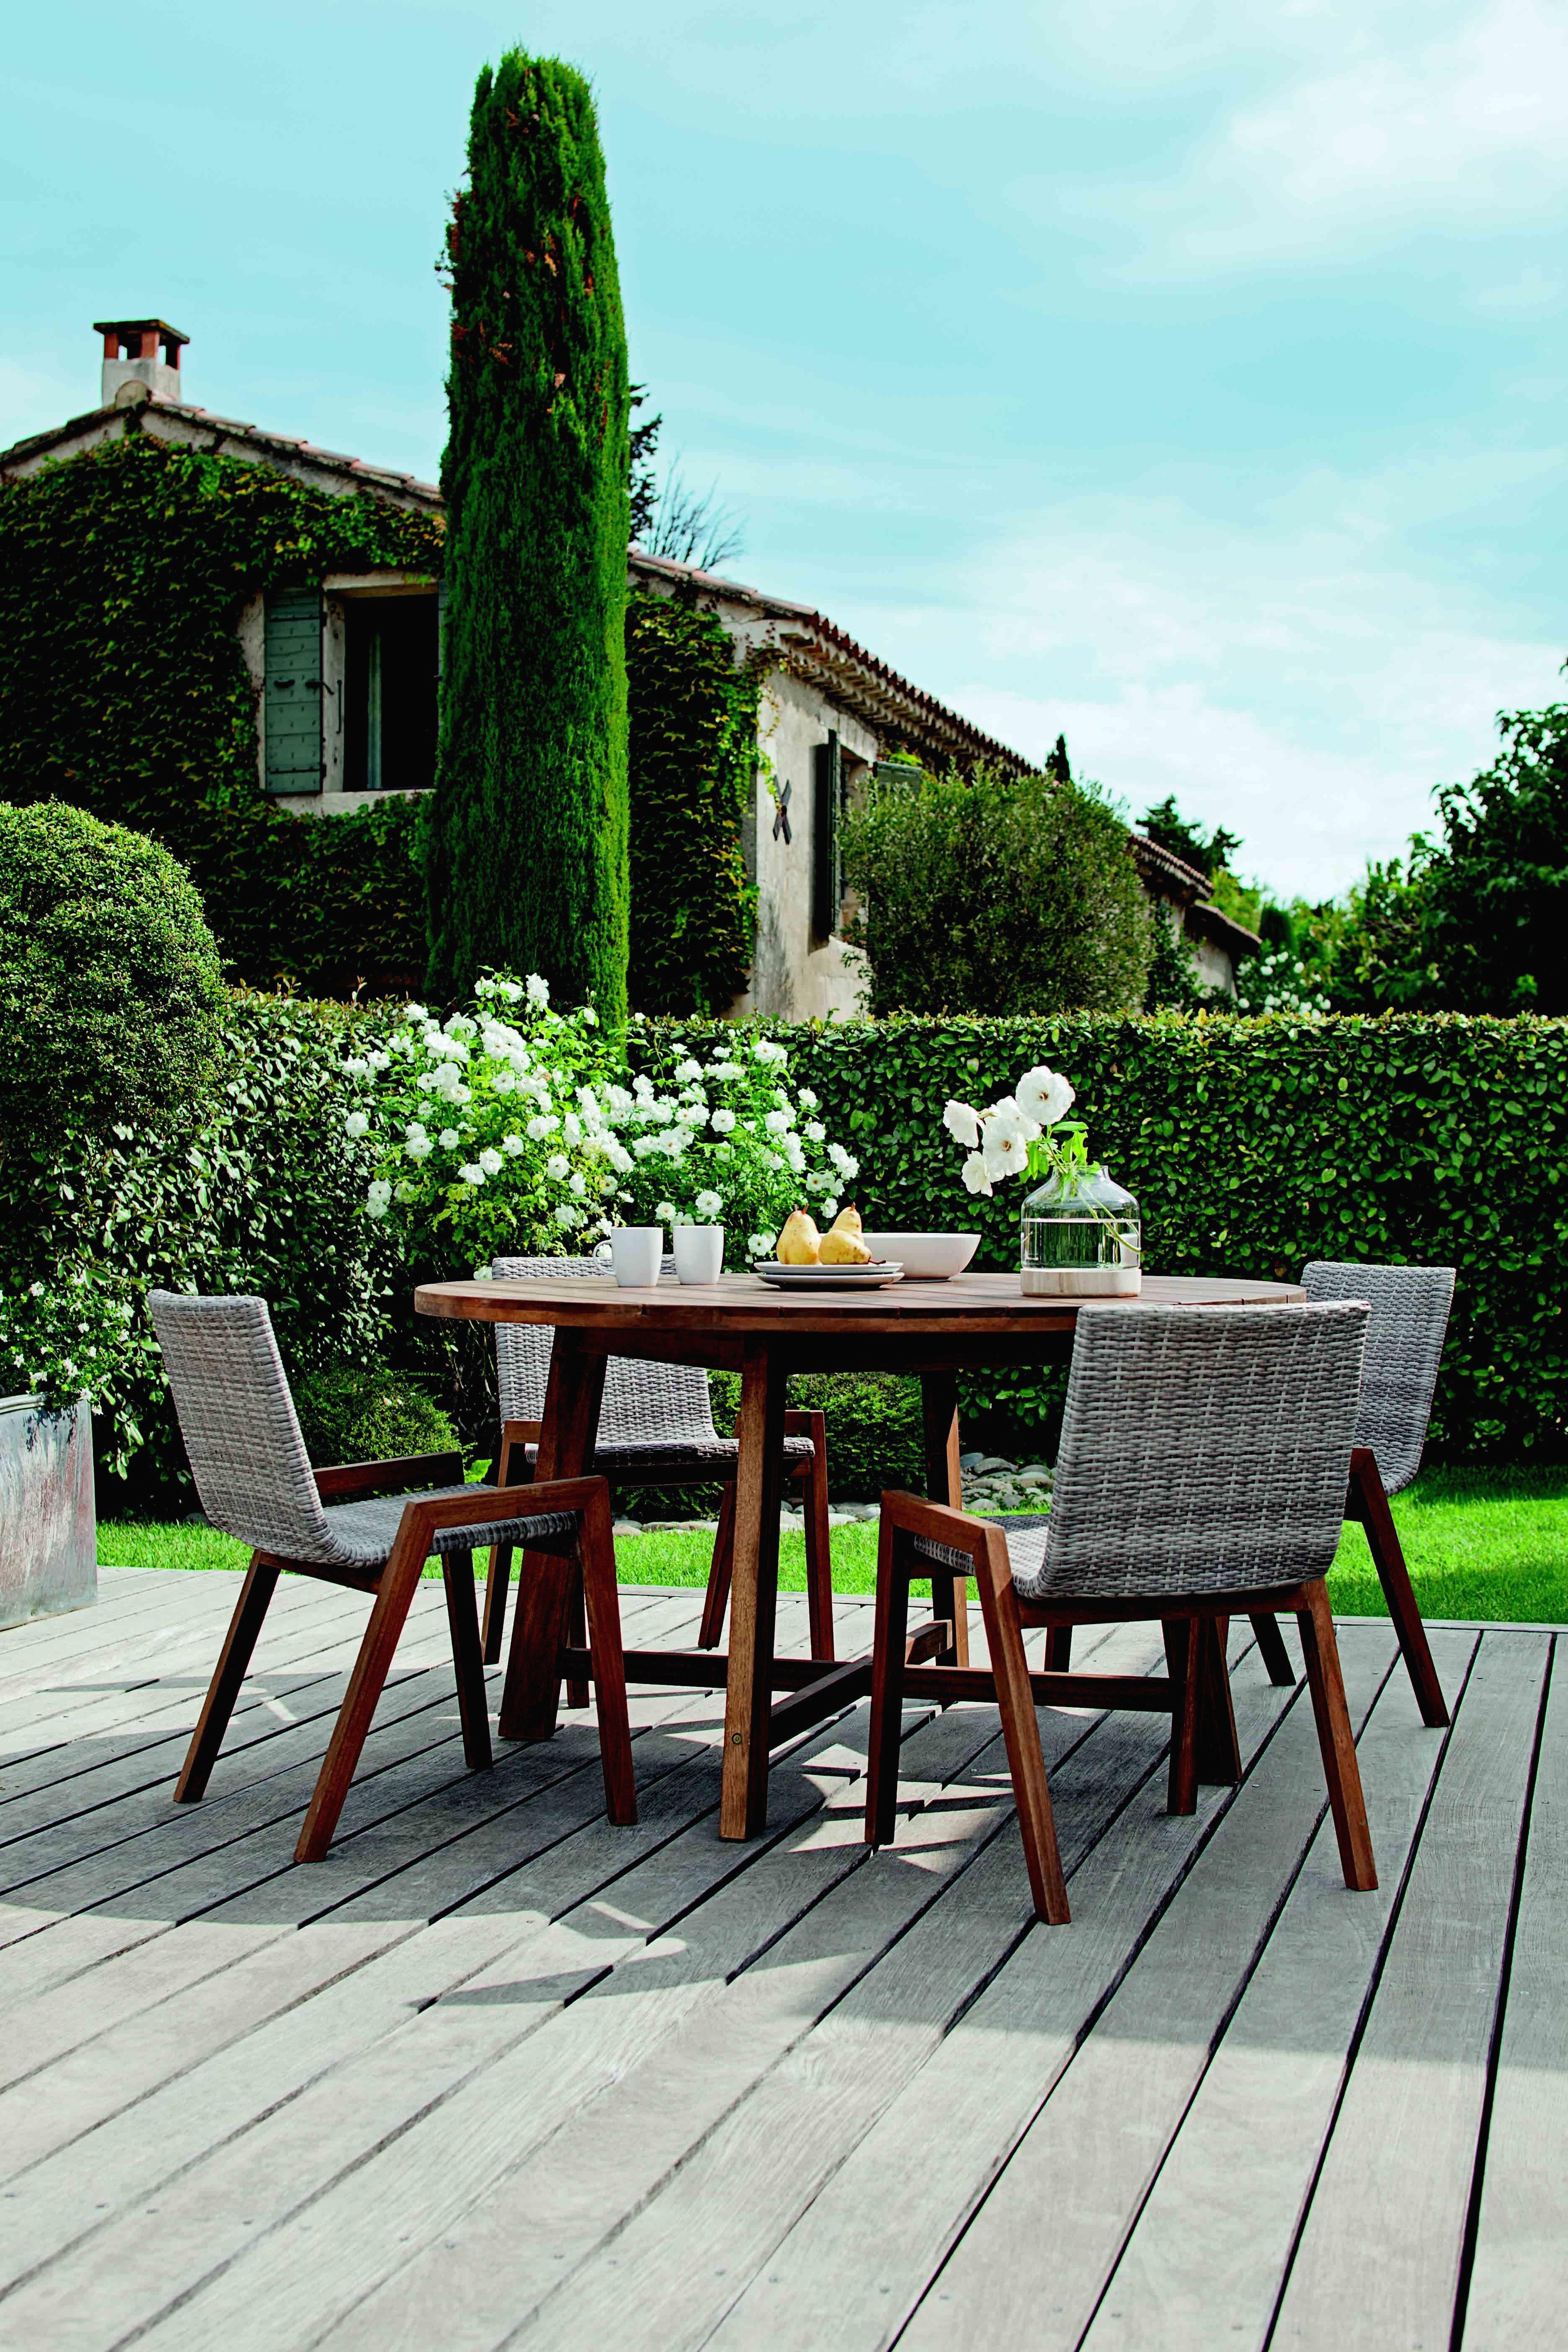 Chaises De Jardin Ikea Meilleur De Galerie Banc Exterieur Ikea Meilleur De Salon De Jardin Empilable Best